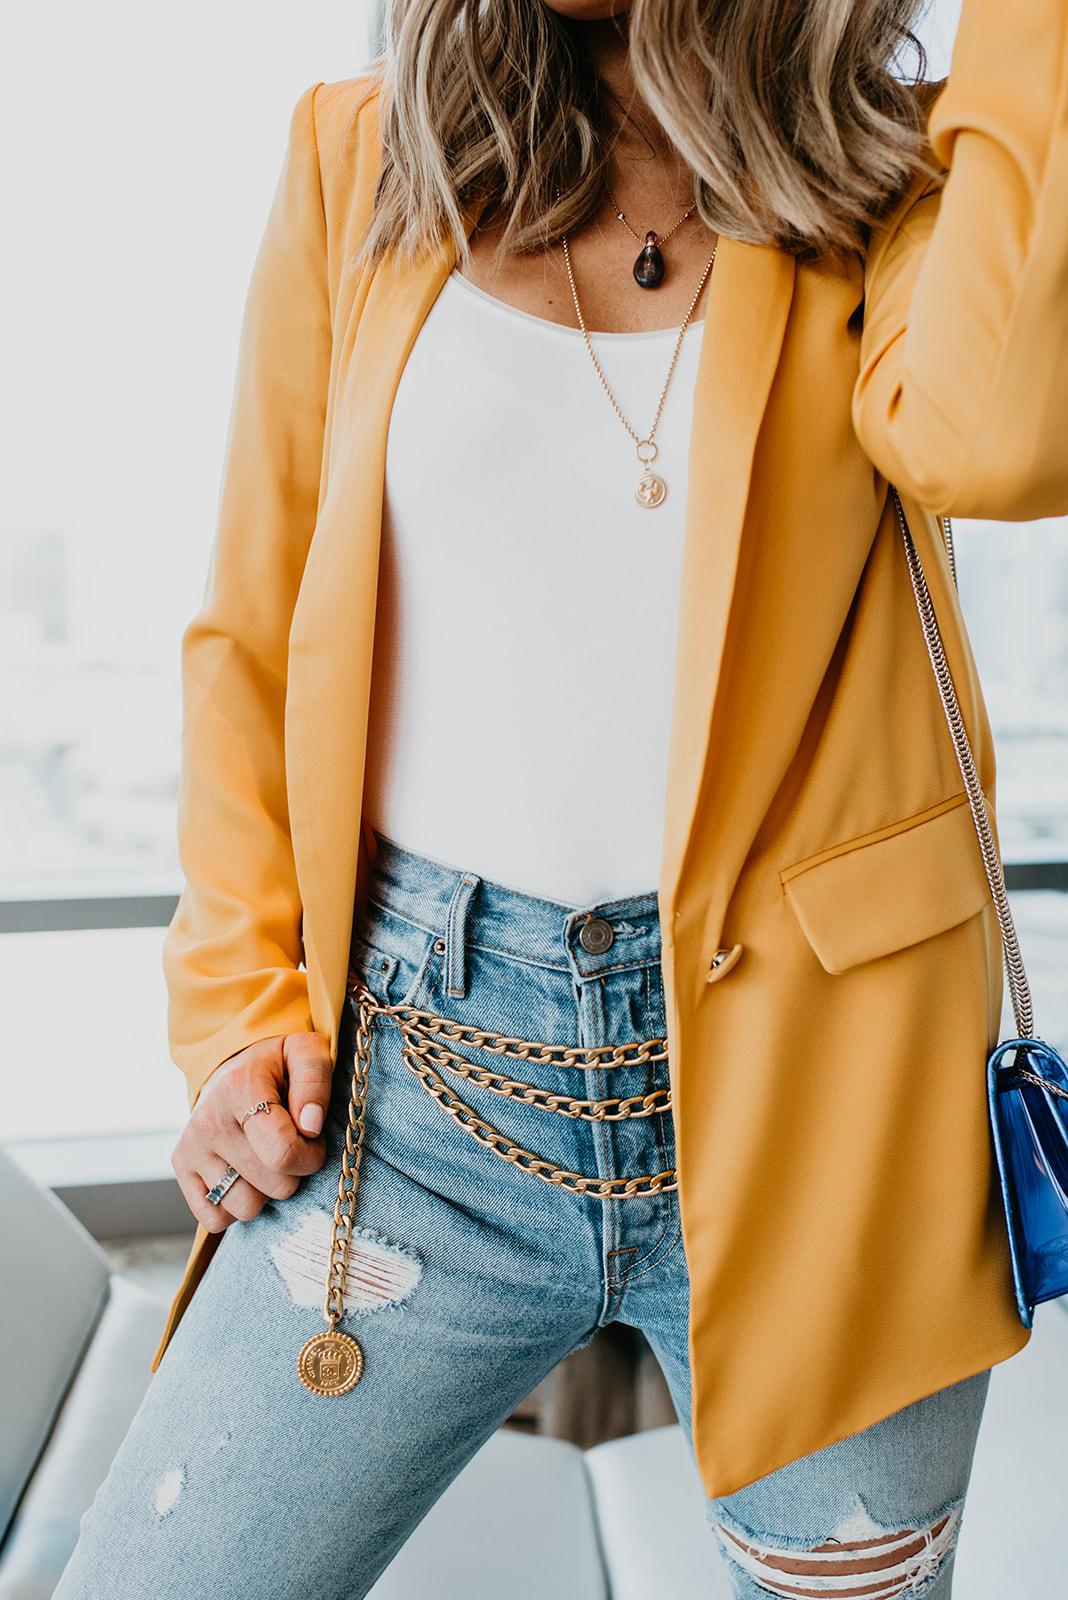 Wilson Gabrielle Branding Shoot at Palms Resort - Outfit Details, yellow blazer